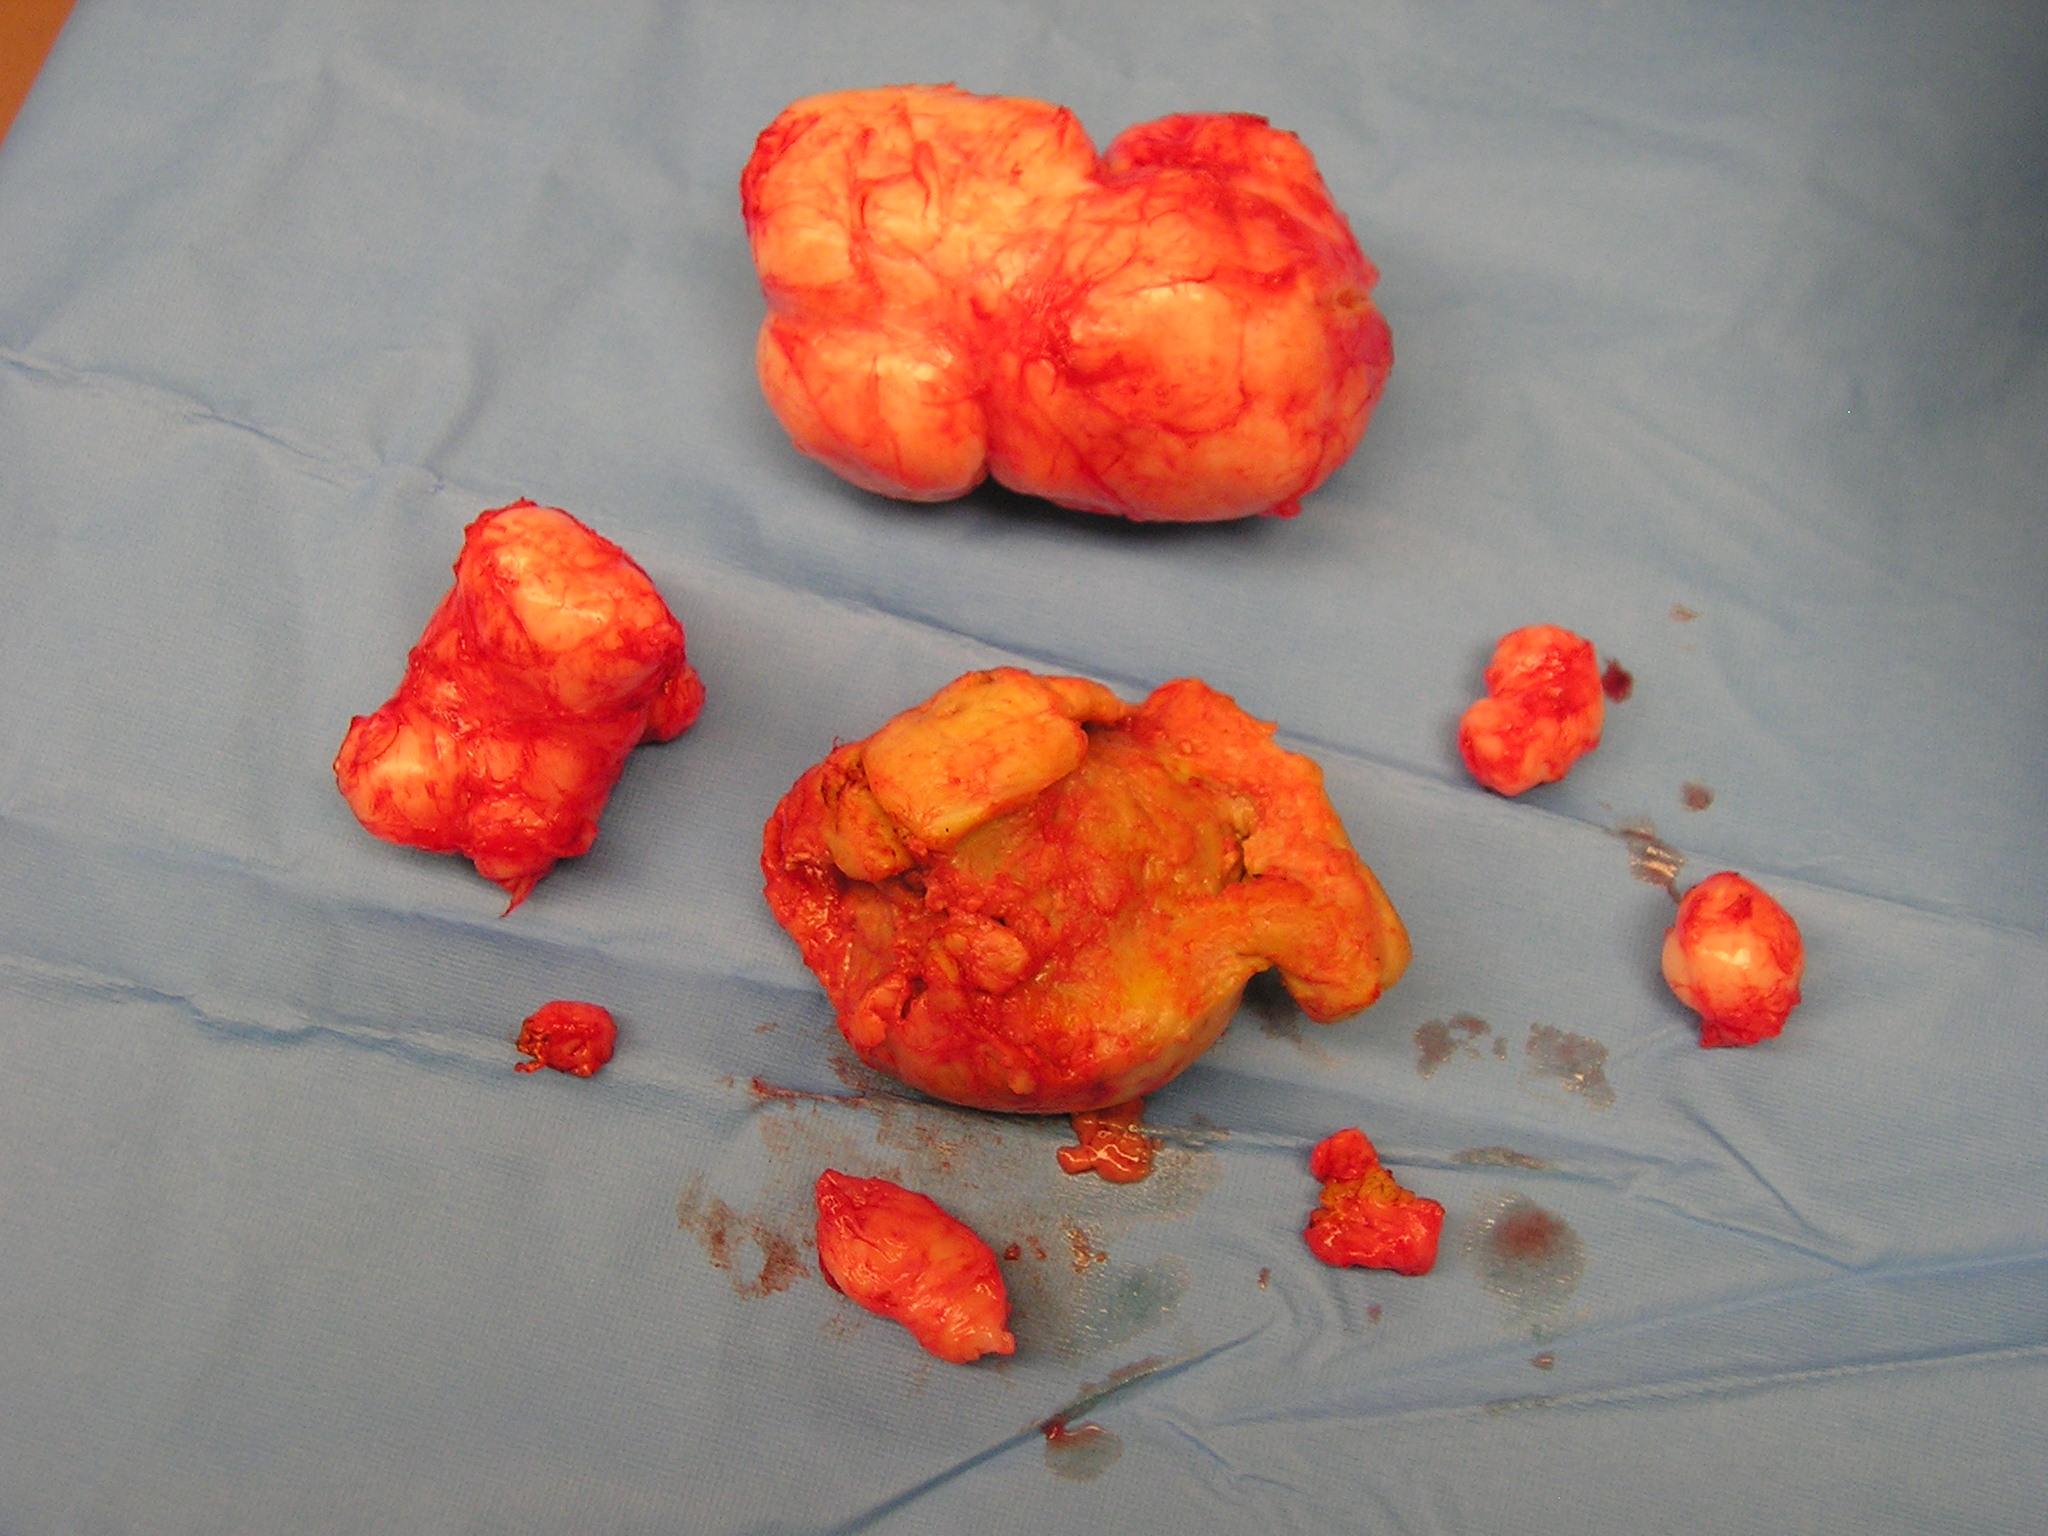 Treating Fibroids Uterus Naturally